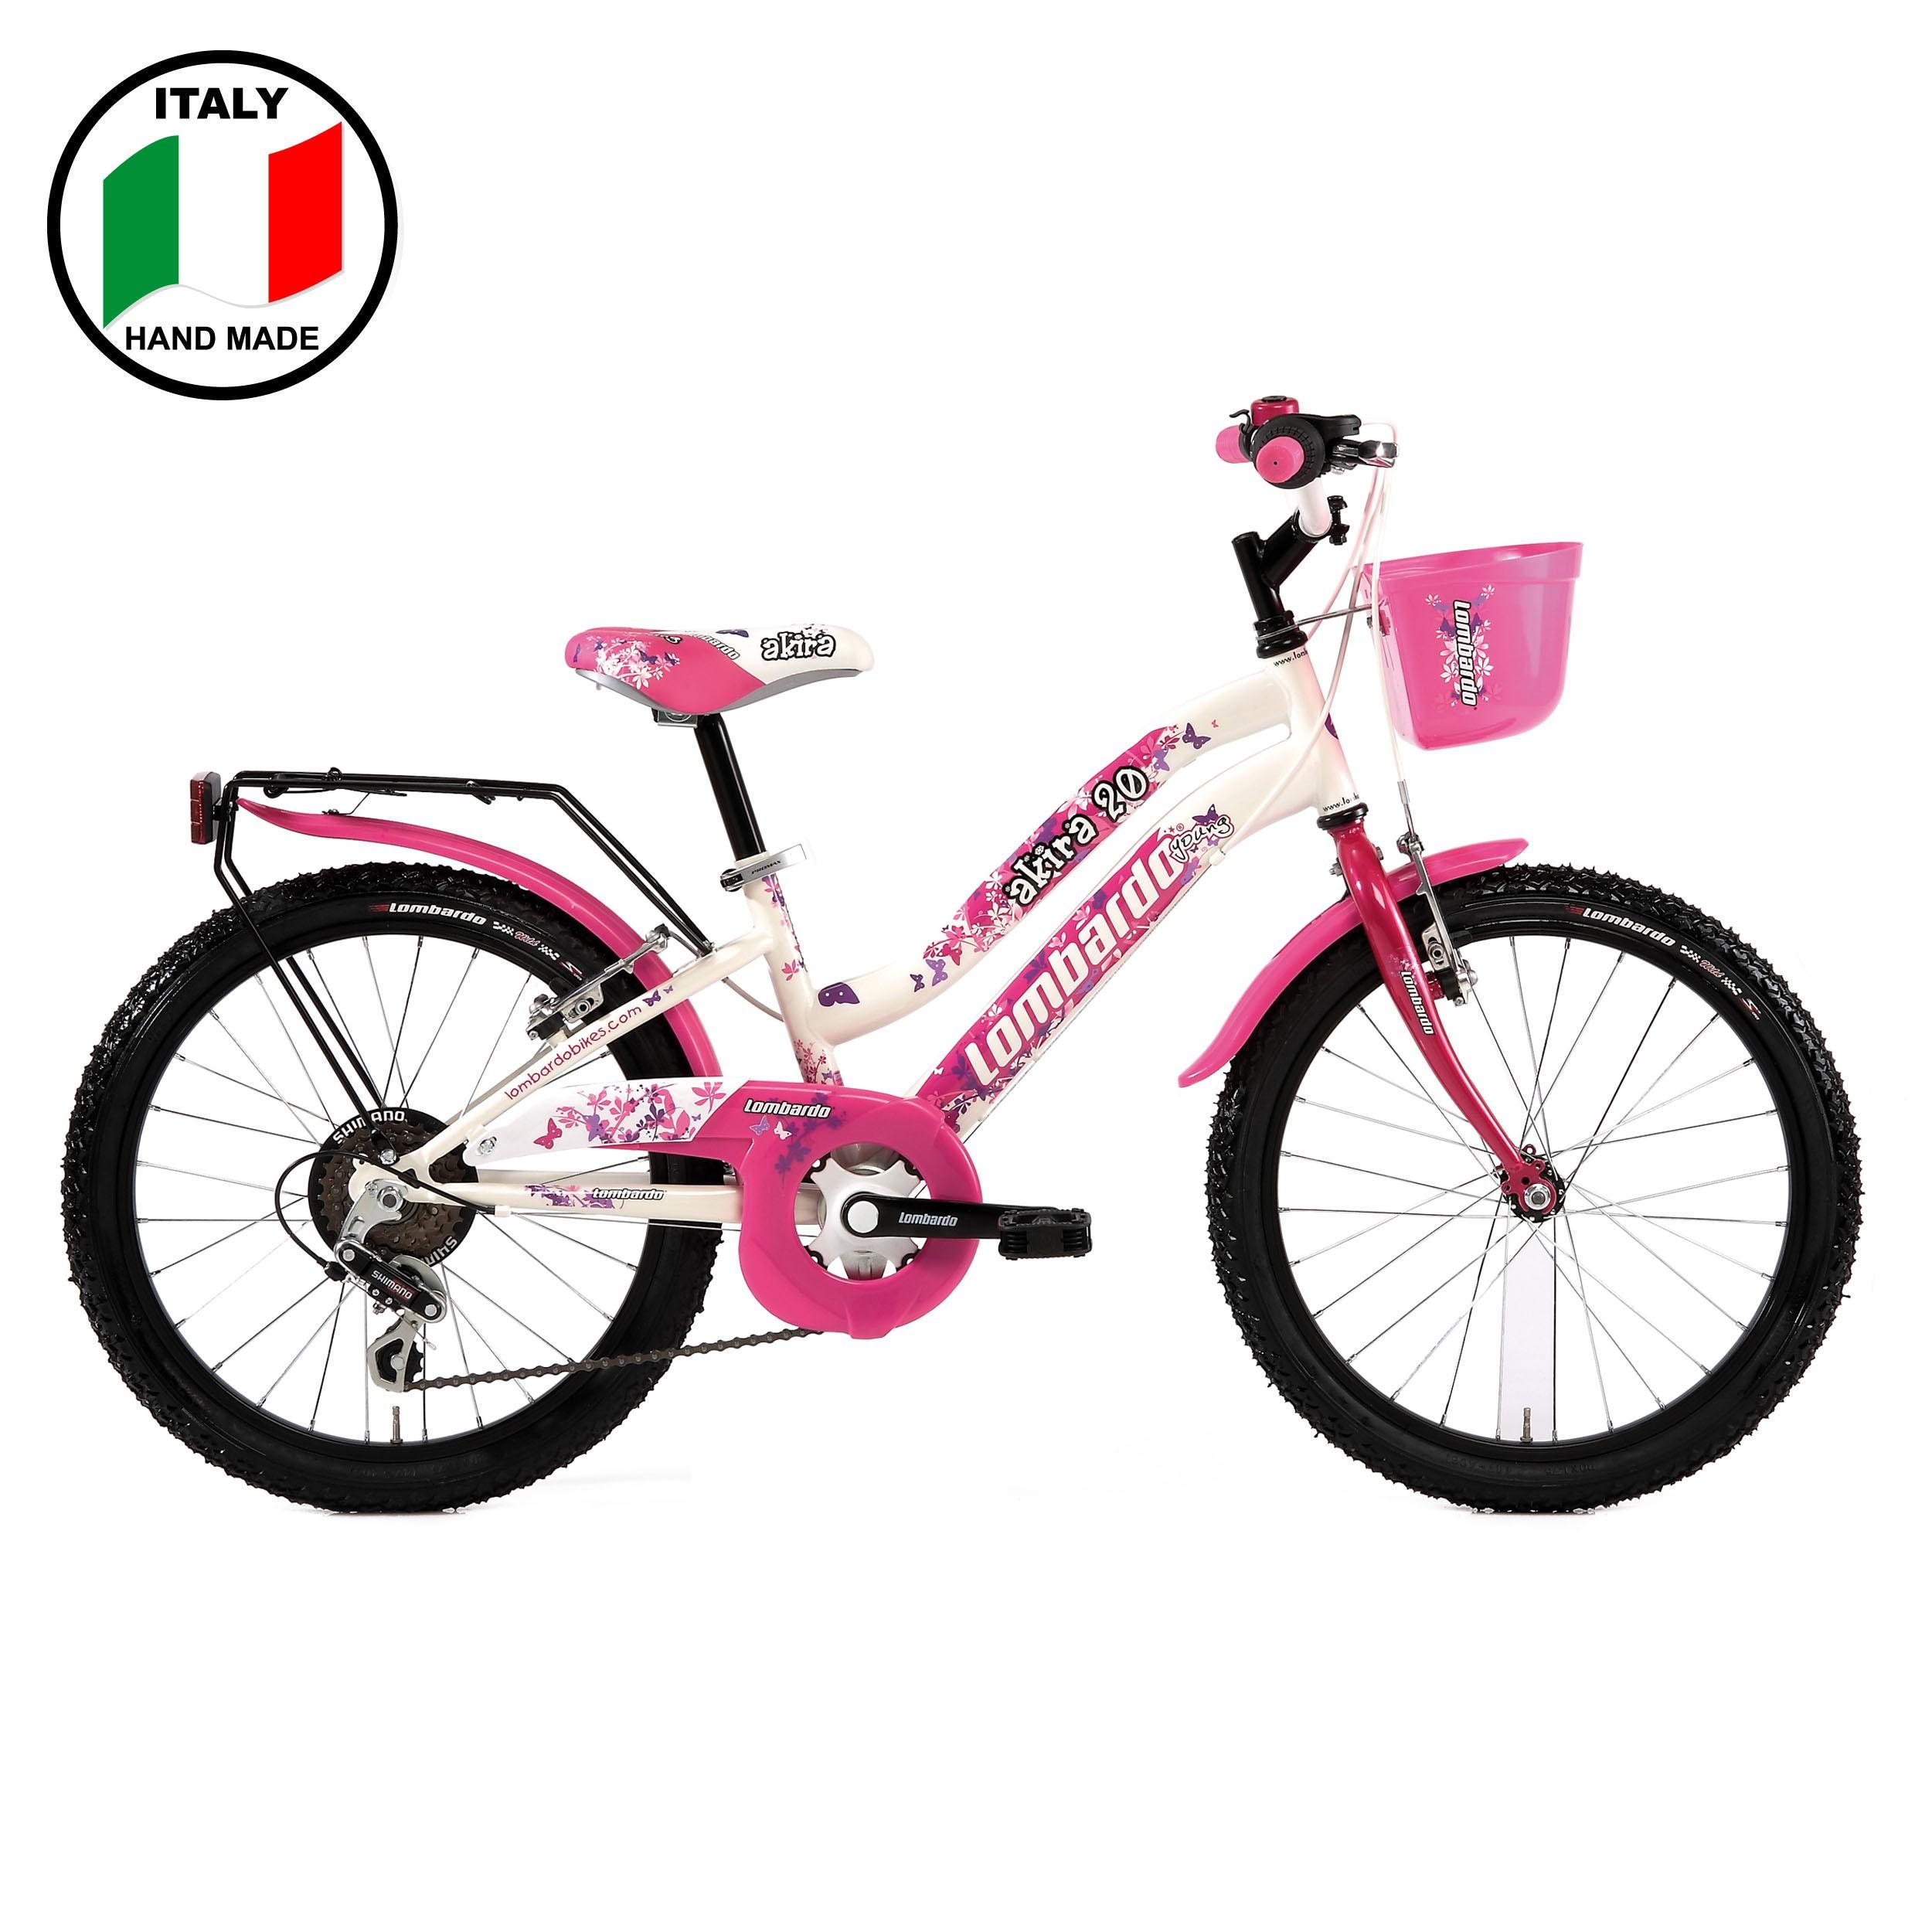 Lombardo Akira 20 inch White and Pink